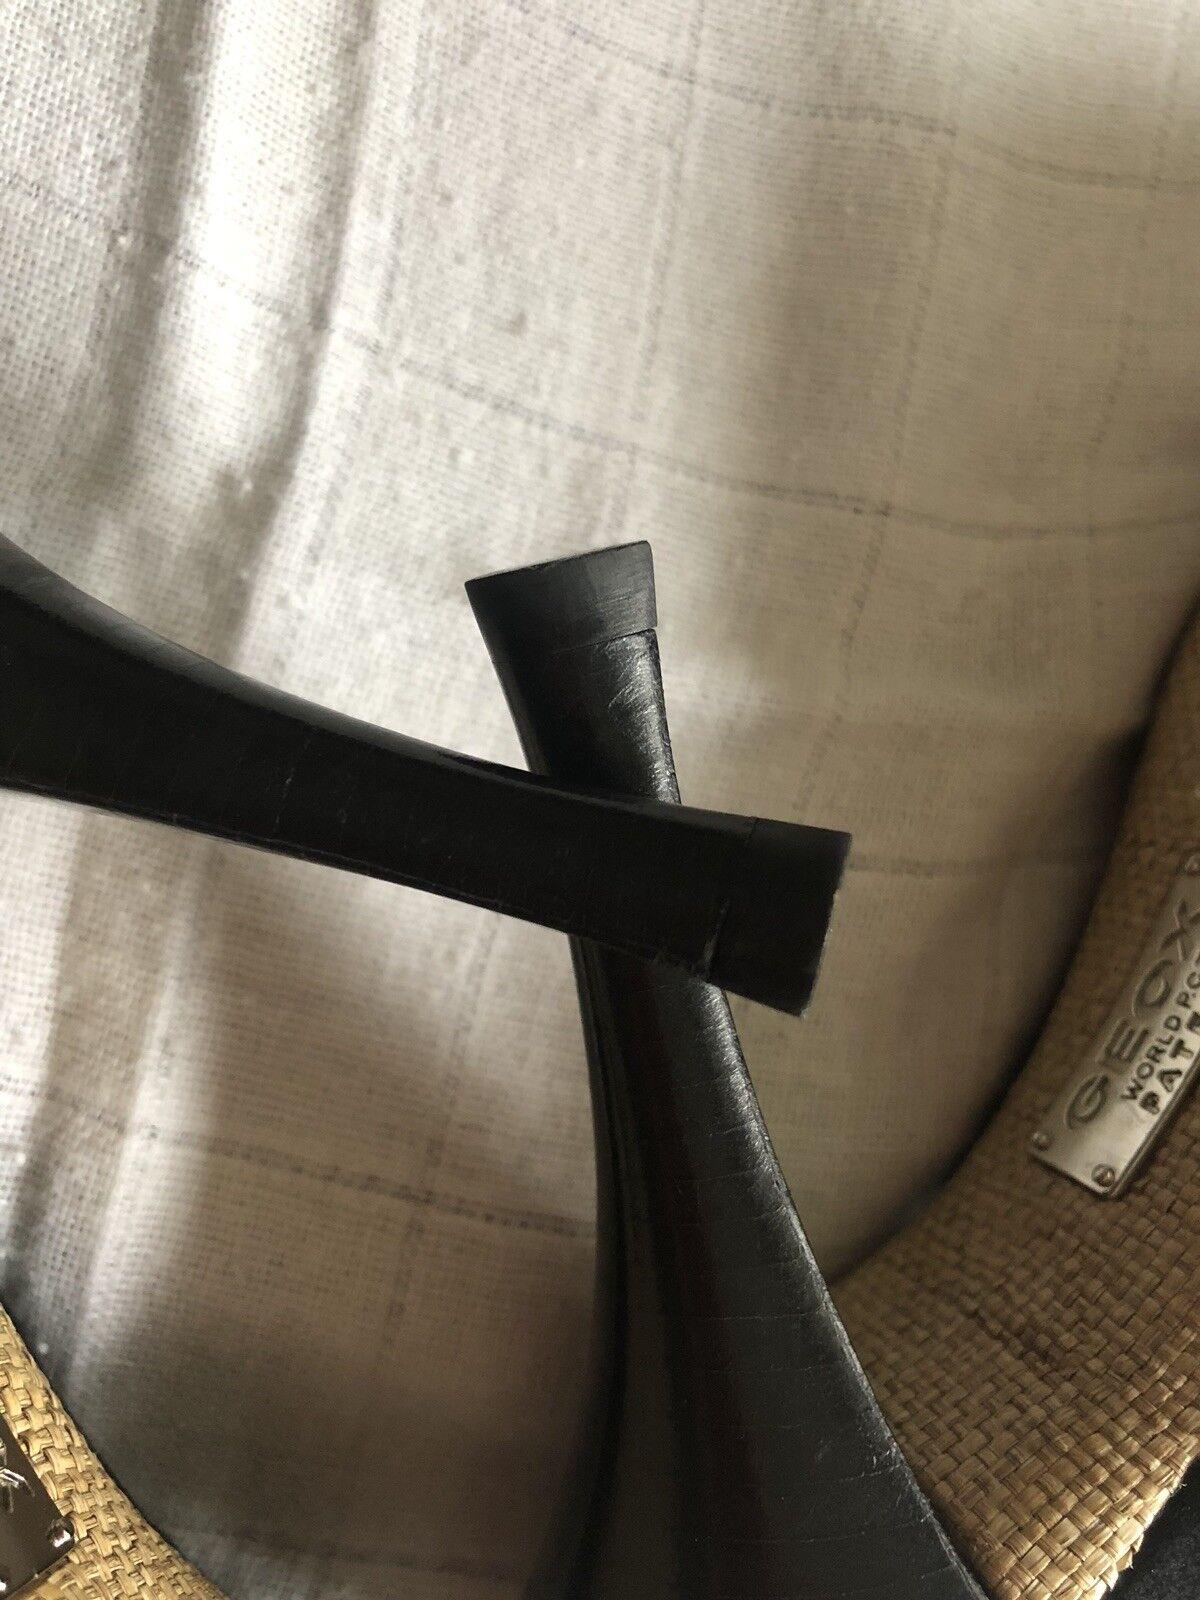 Geox Damenschuhe gr 35 schwarz schwarz schwarz 1e9a62